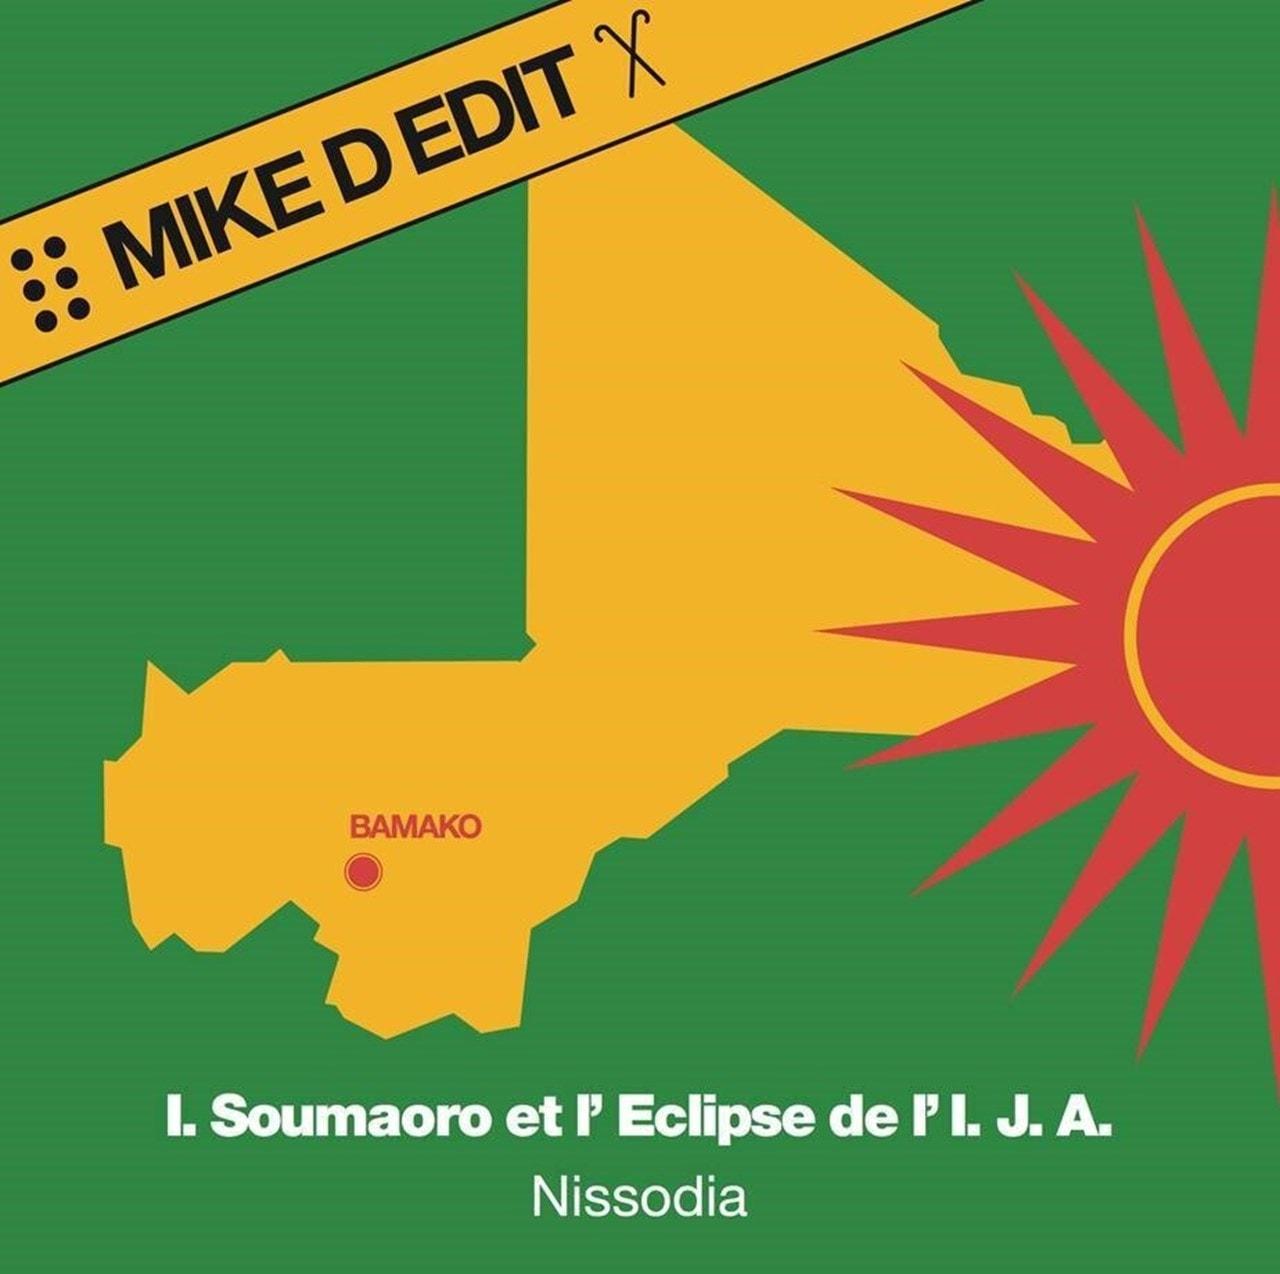 Nissodia (Mike D Edit) - 1